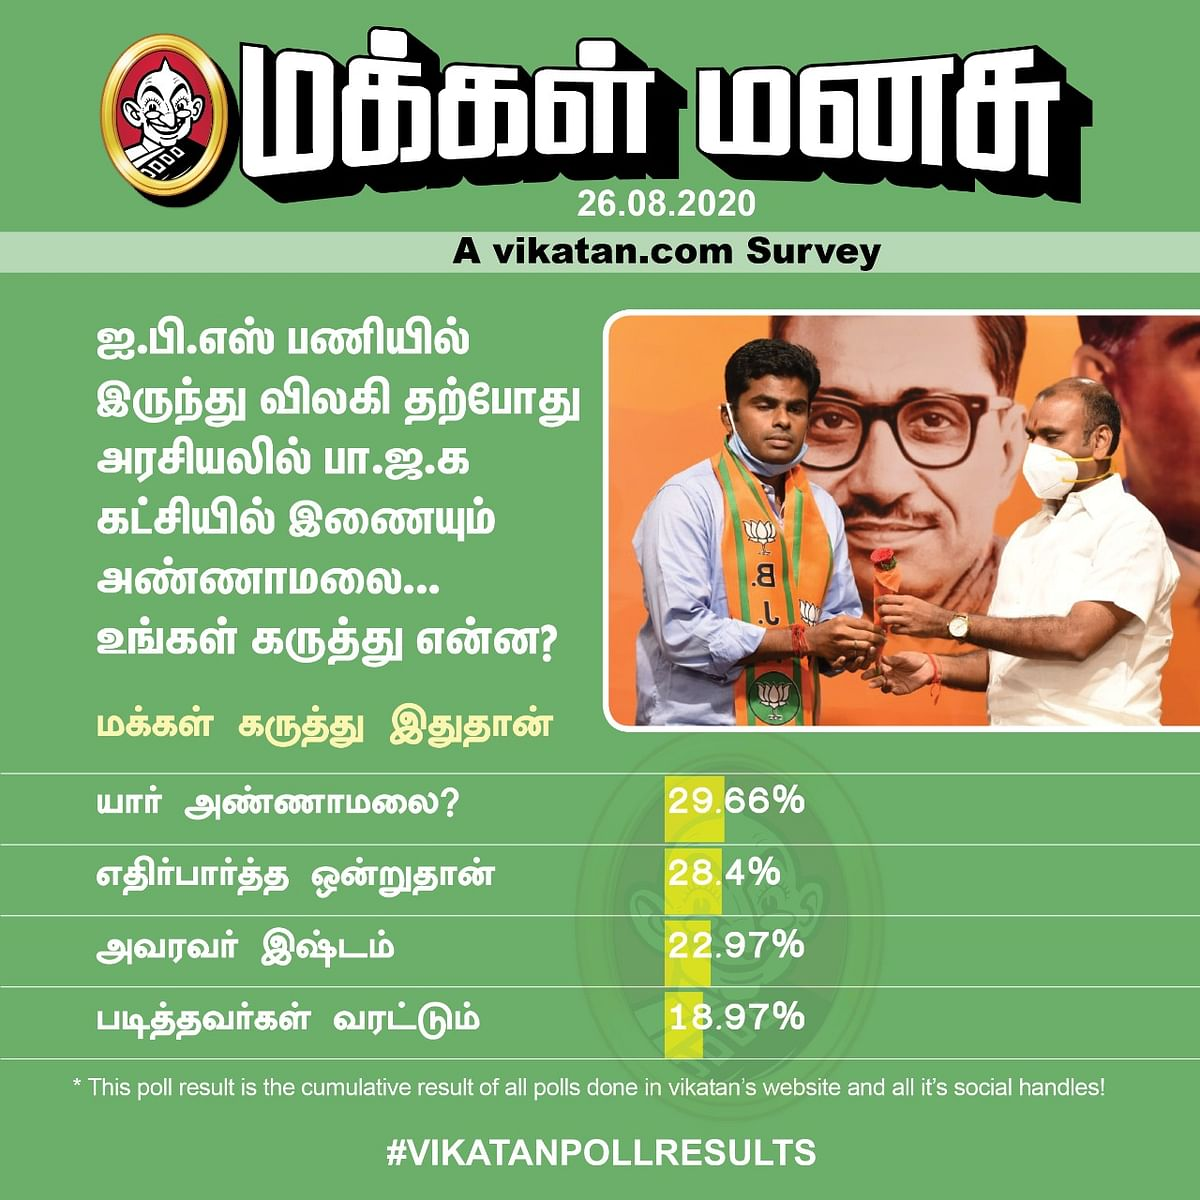 Annamalai | Vikatan Poll